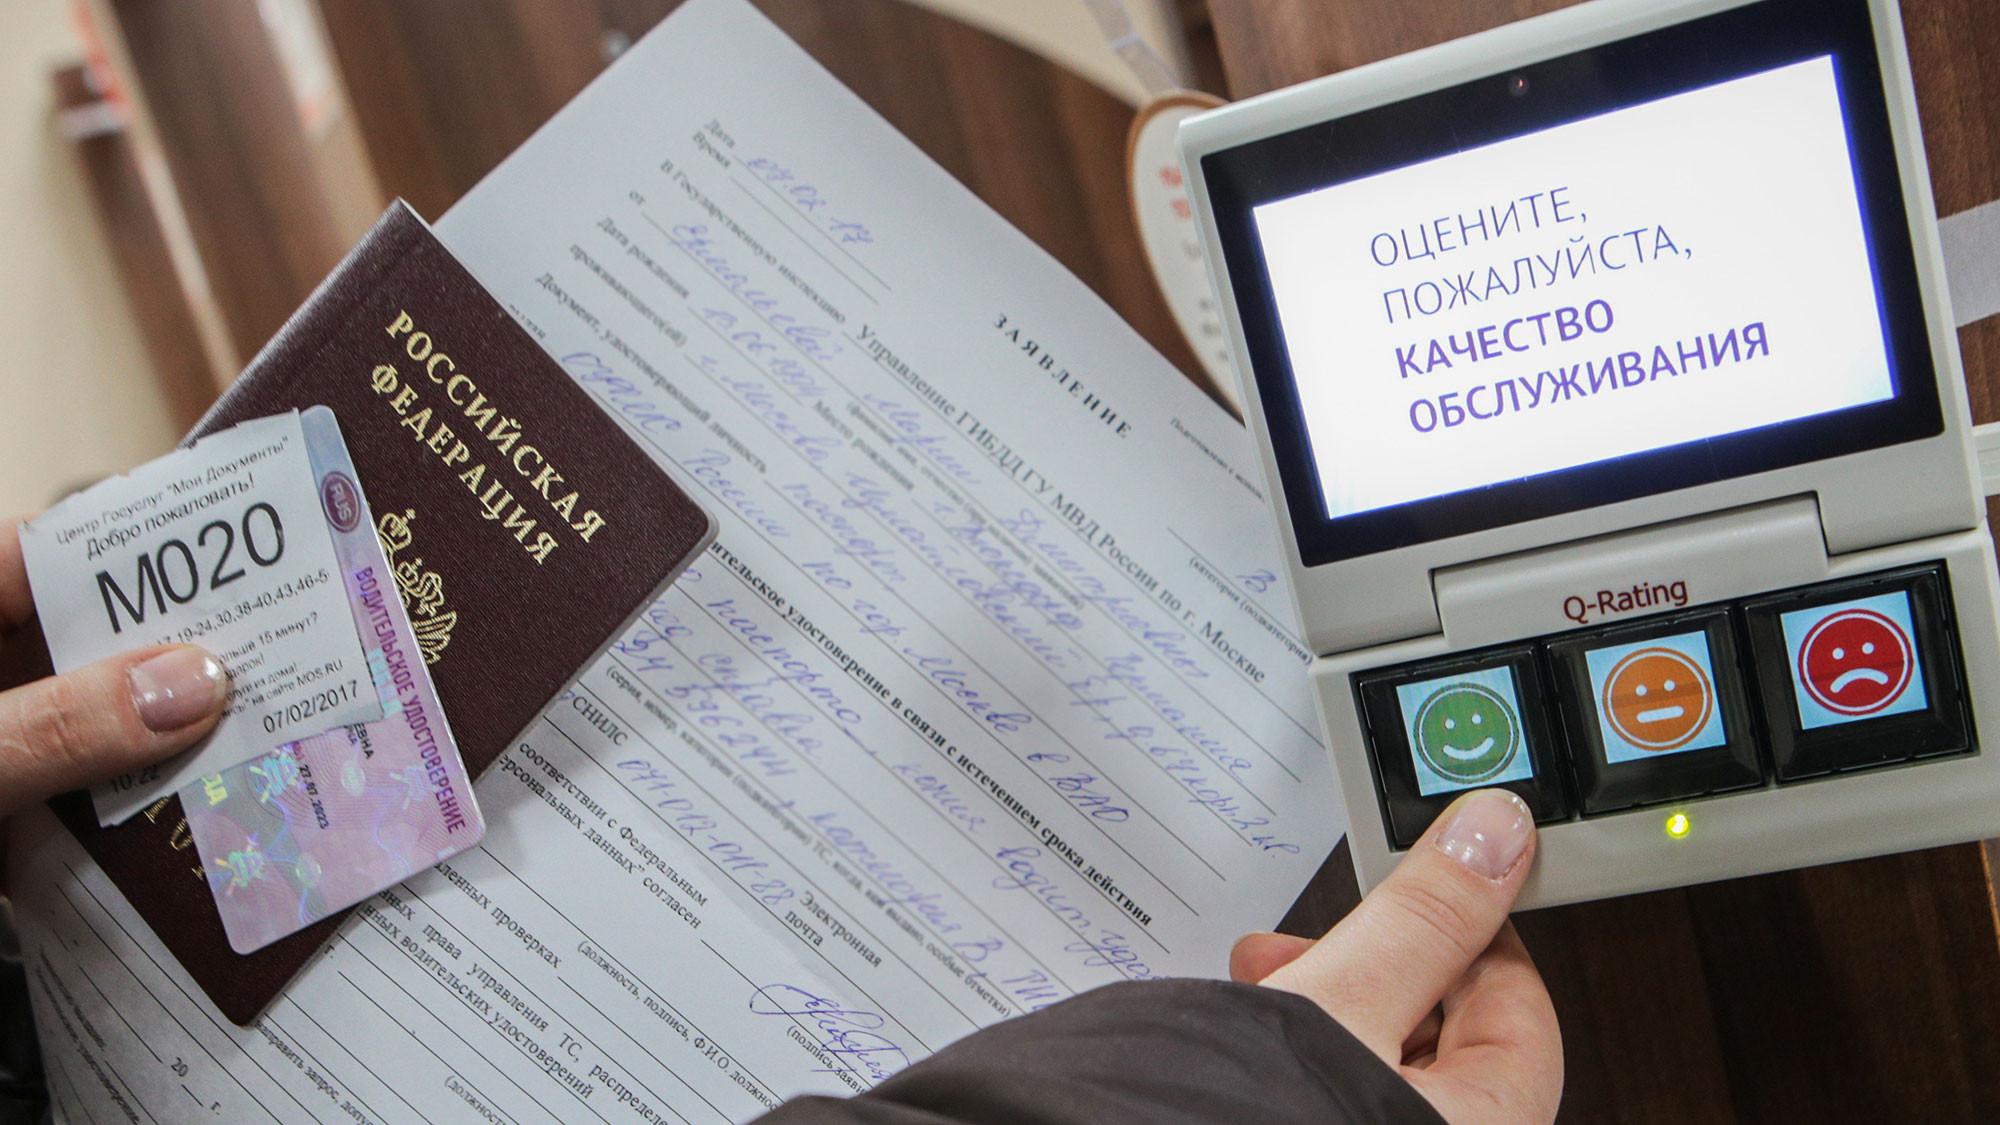 <p>Фото: &copy;&nbsp;Агентство городских новостей &laquo;Москва&raquo; / Андрей&nbsp;<span>Никеричев</span></p>